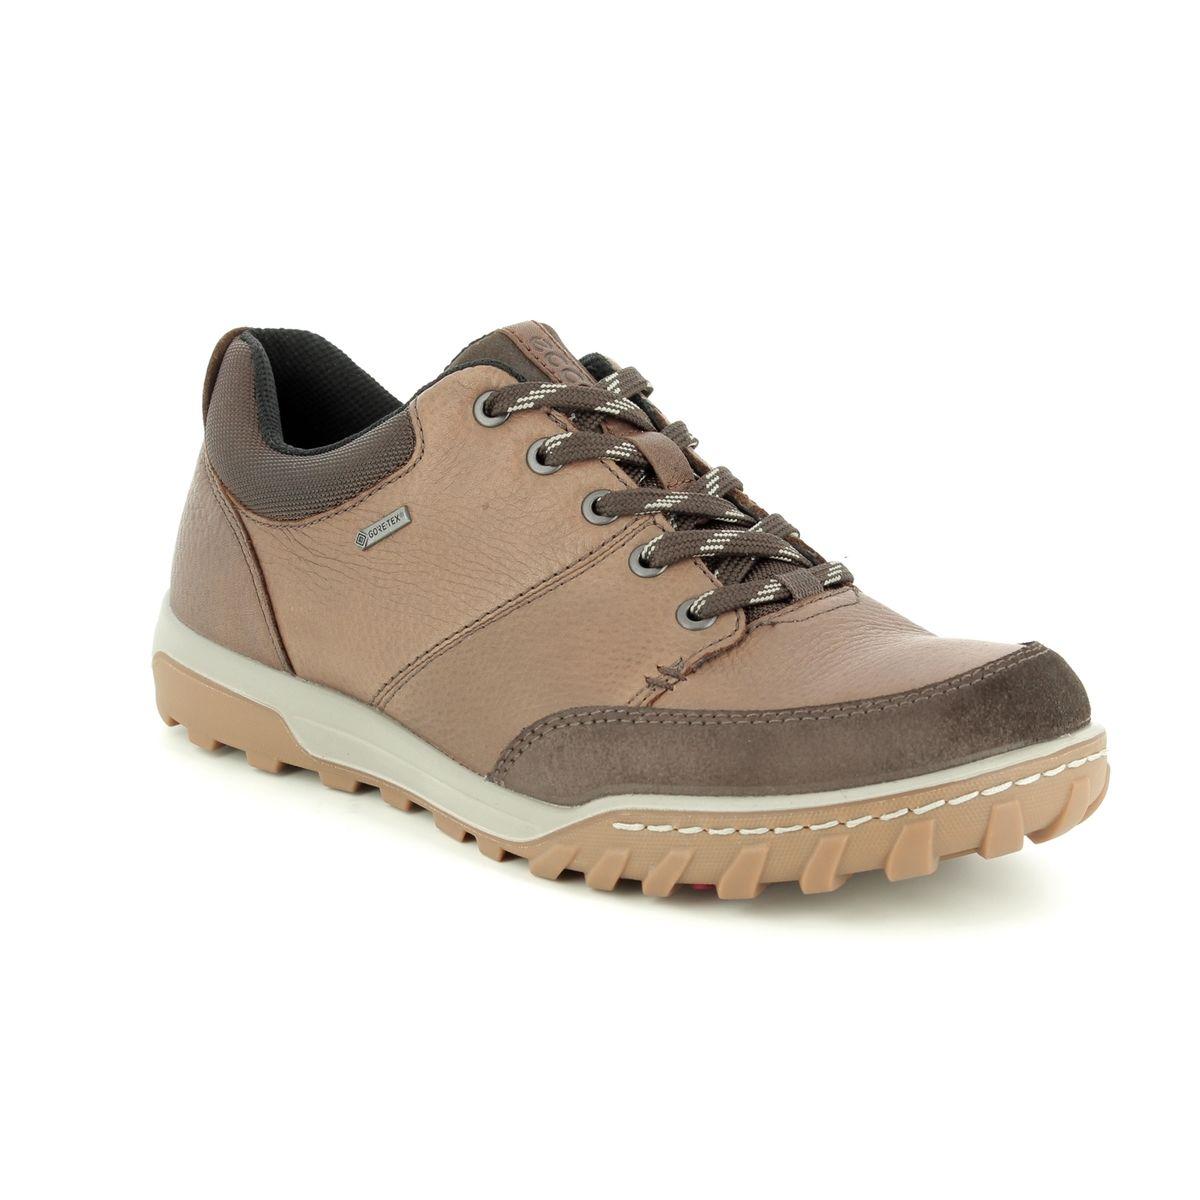 0ae2d092 ECCO Casual Shoes - Brown nubuck - 830704/57008 URBAN LIFESTYLE GORE-TEX